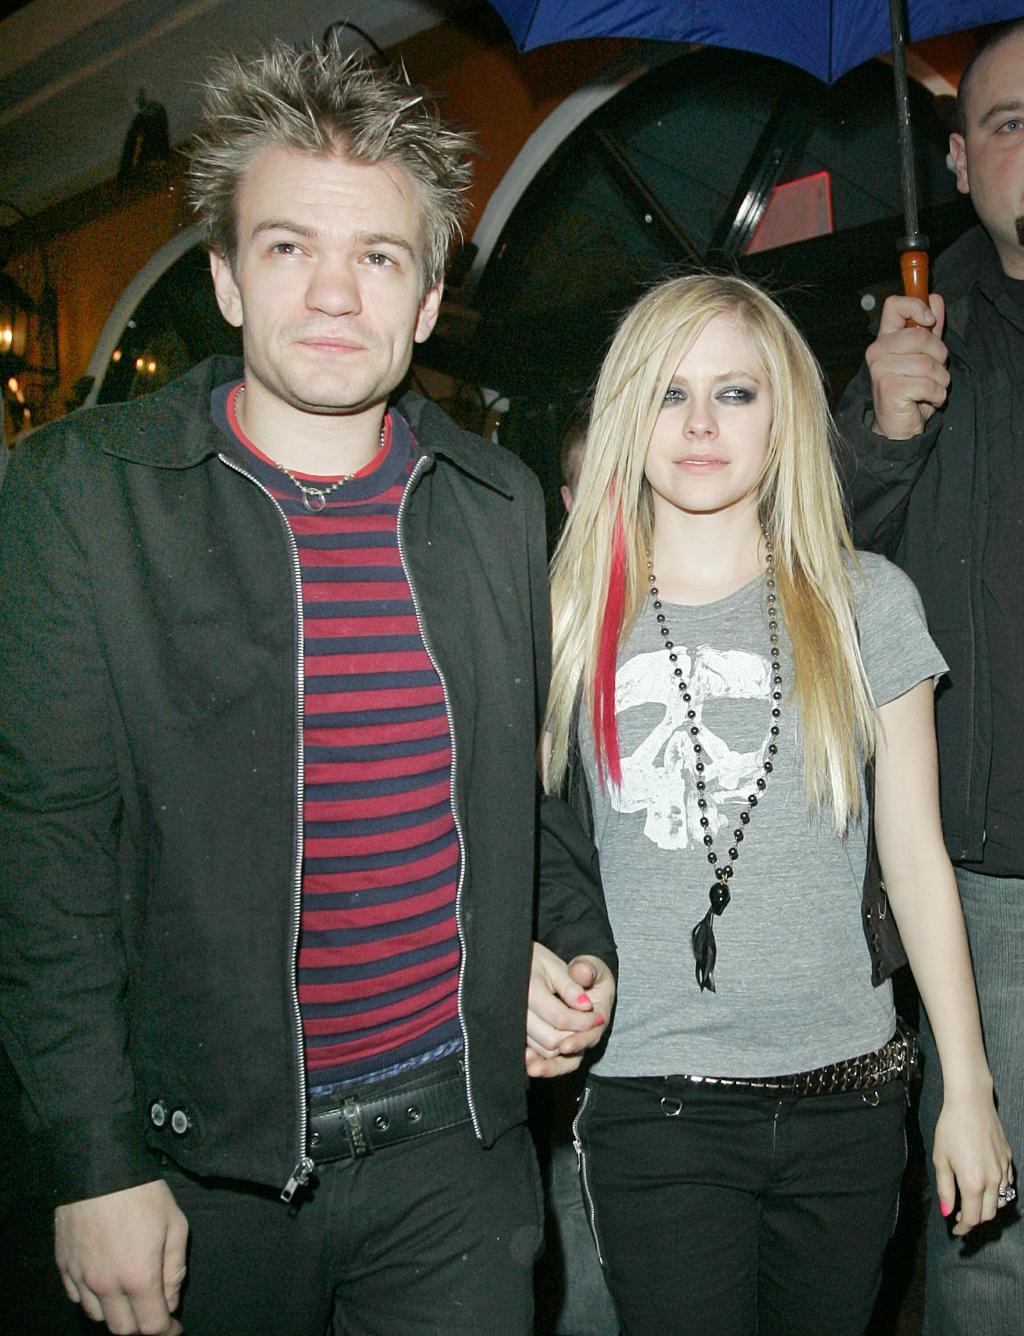 Sum 41 Frontman Says Avril Lavigne       's Stalker Sent Him Death Threats